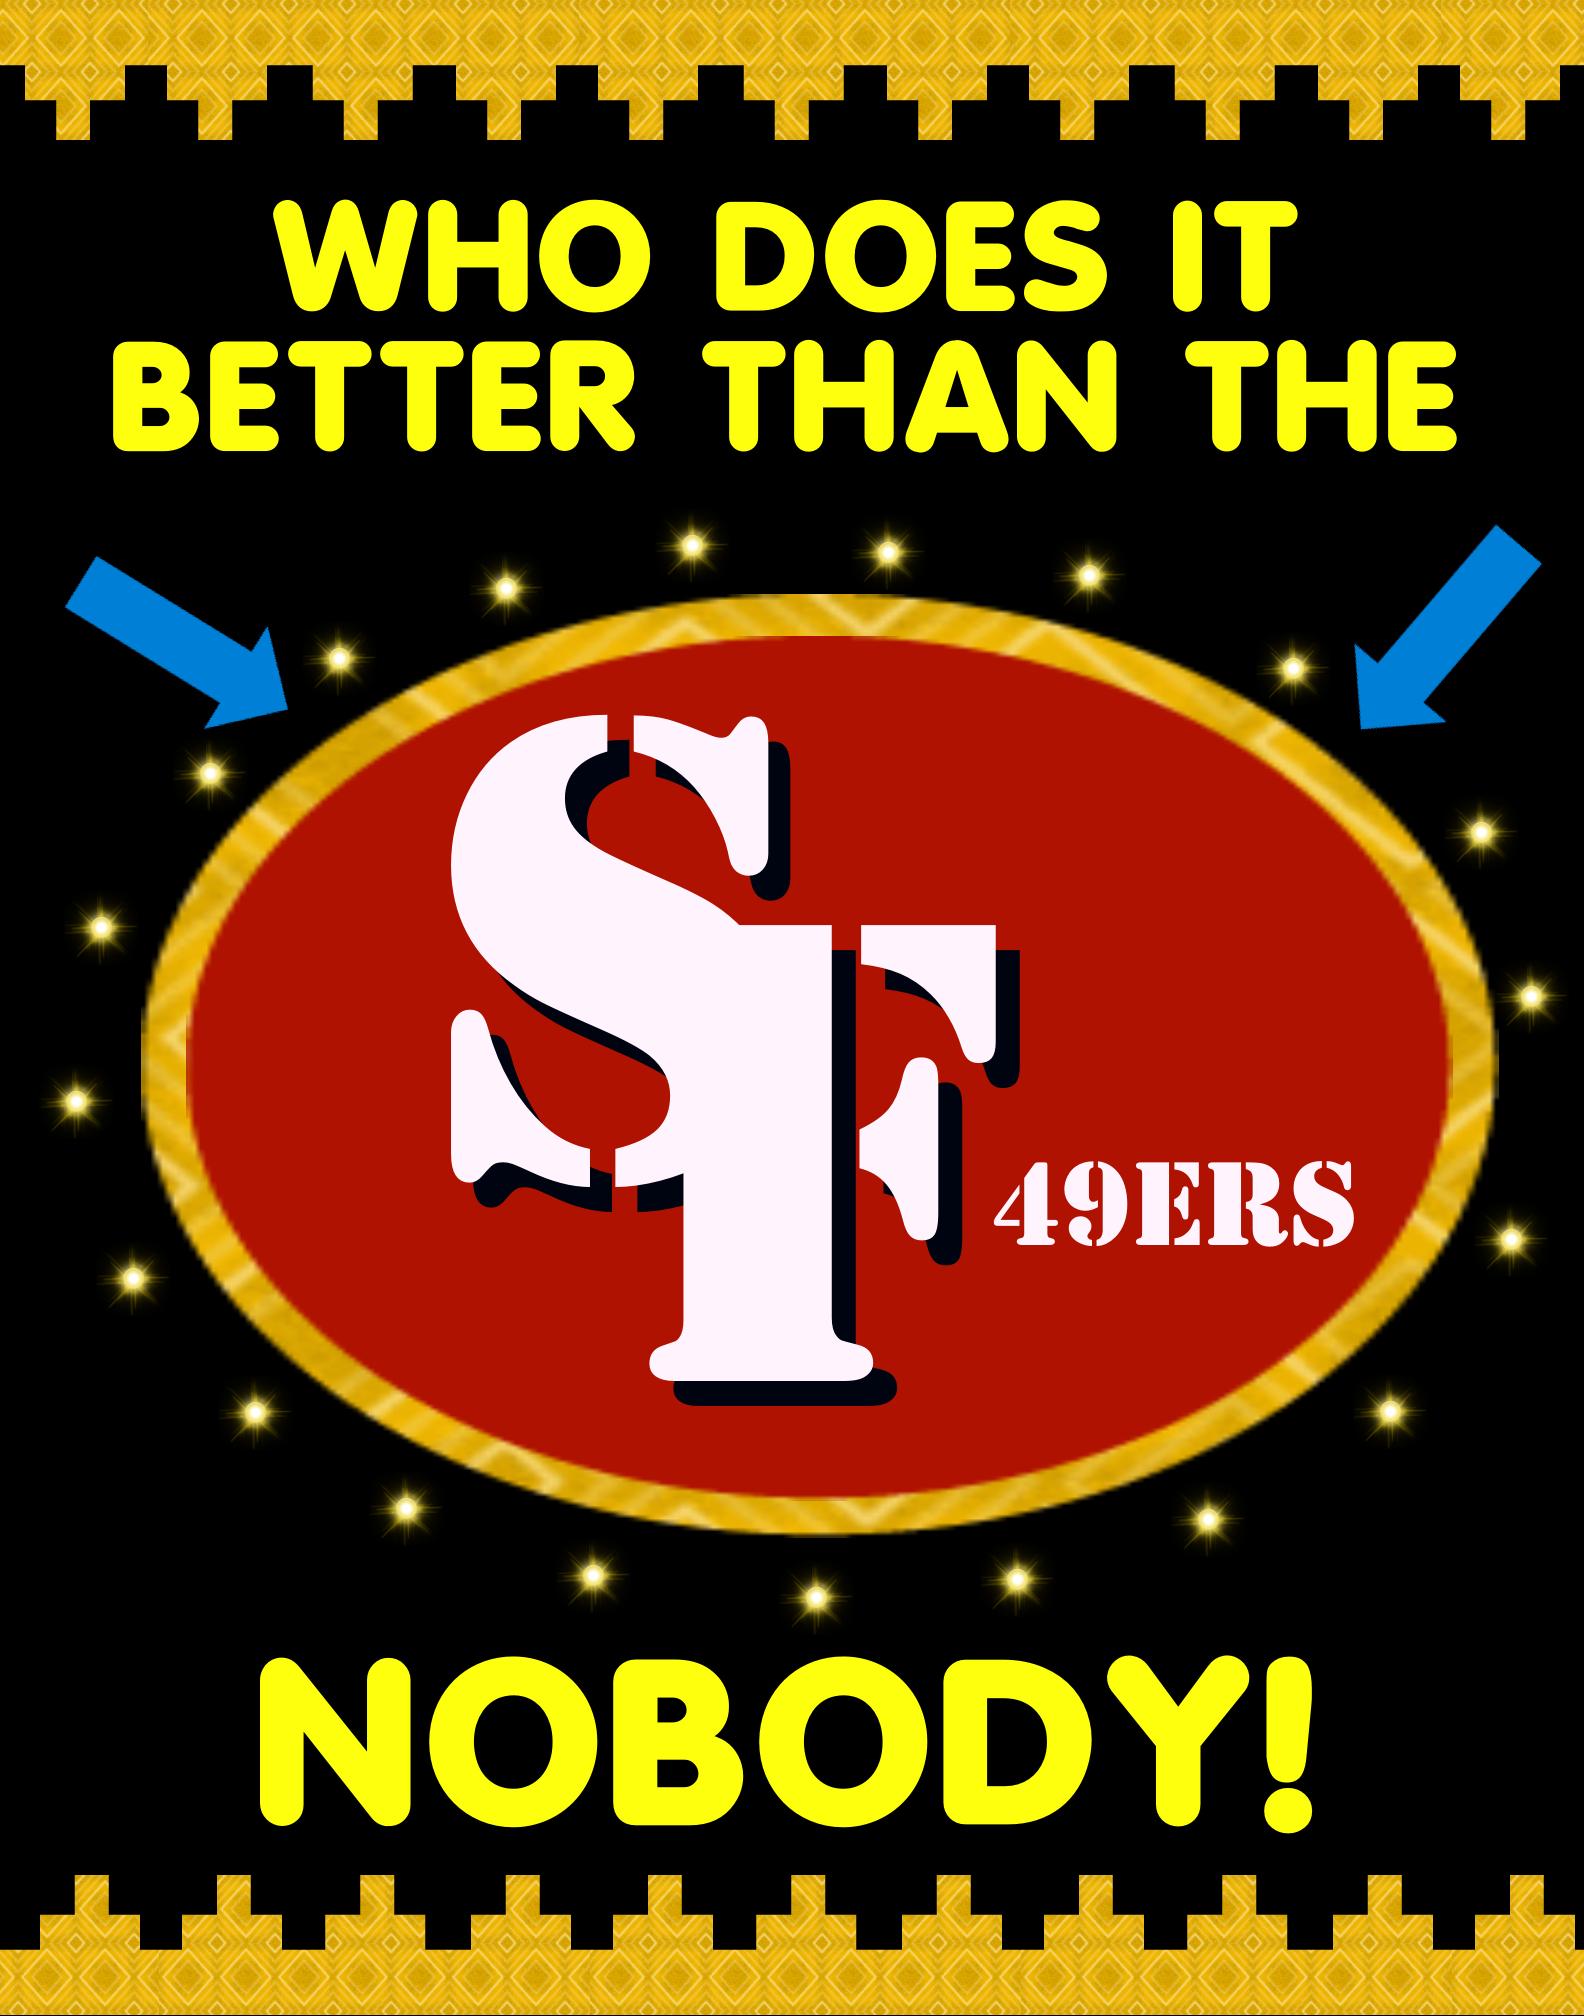 49ers Poster Idea 49ers, San francisco 49ers football